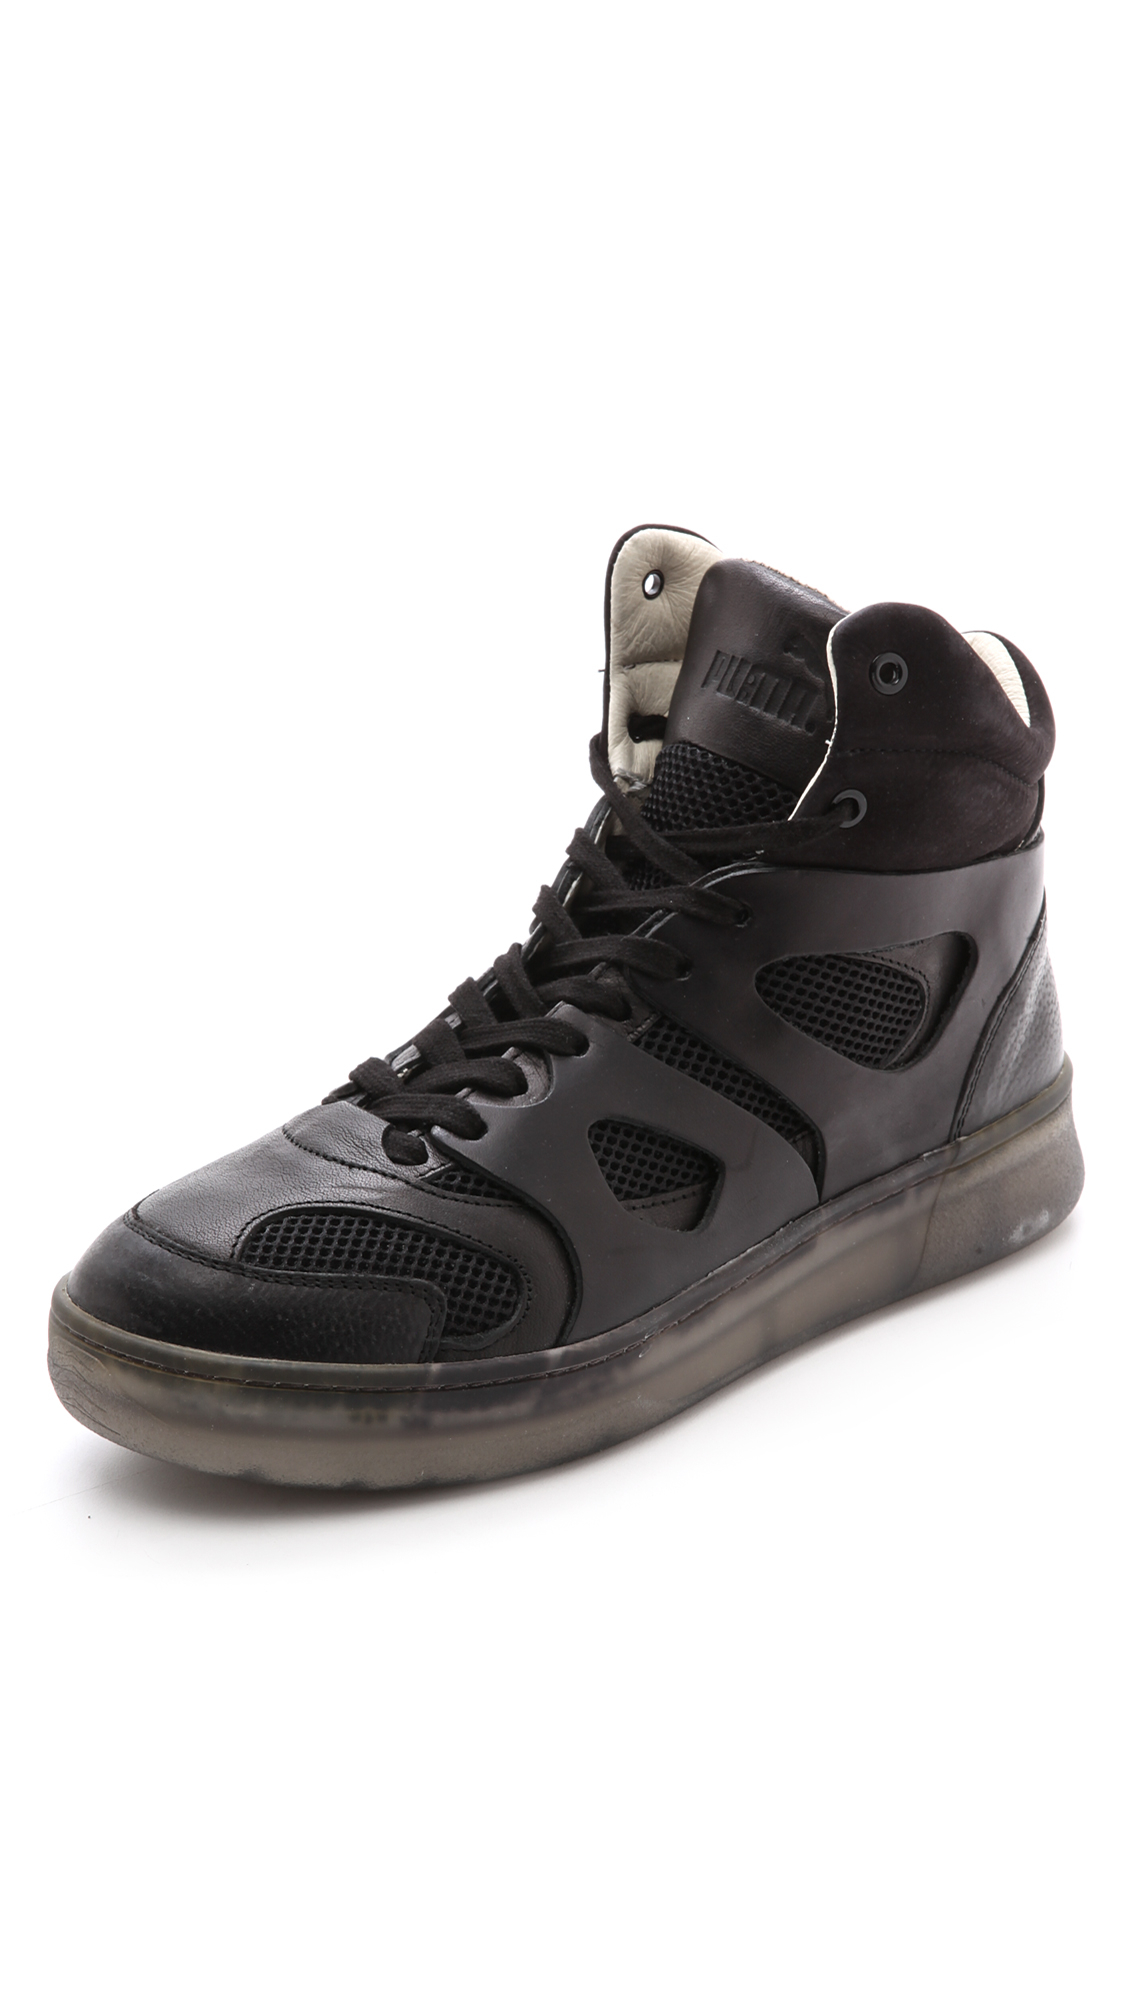 Lyst - Alexander Mcqueen X Puma Move Sneakers in Black for Men